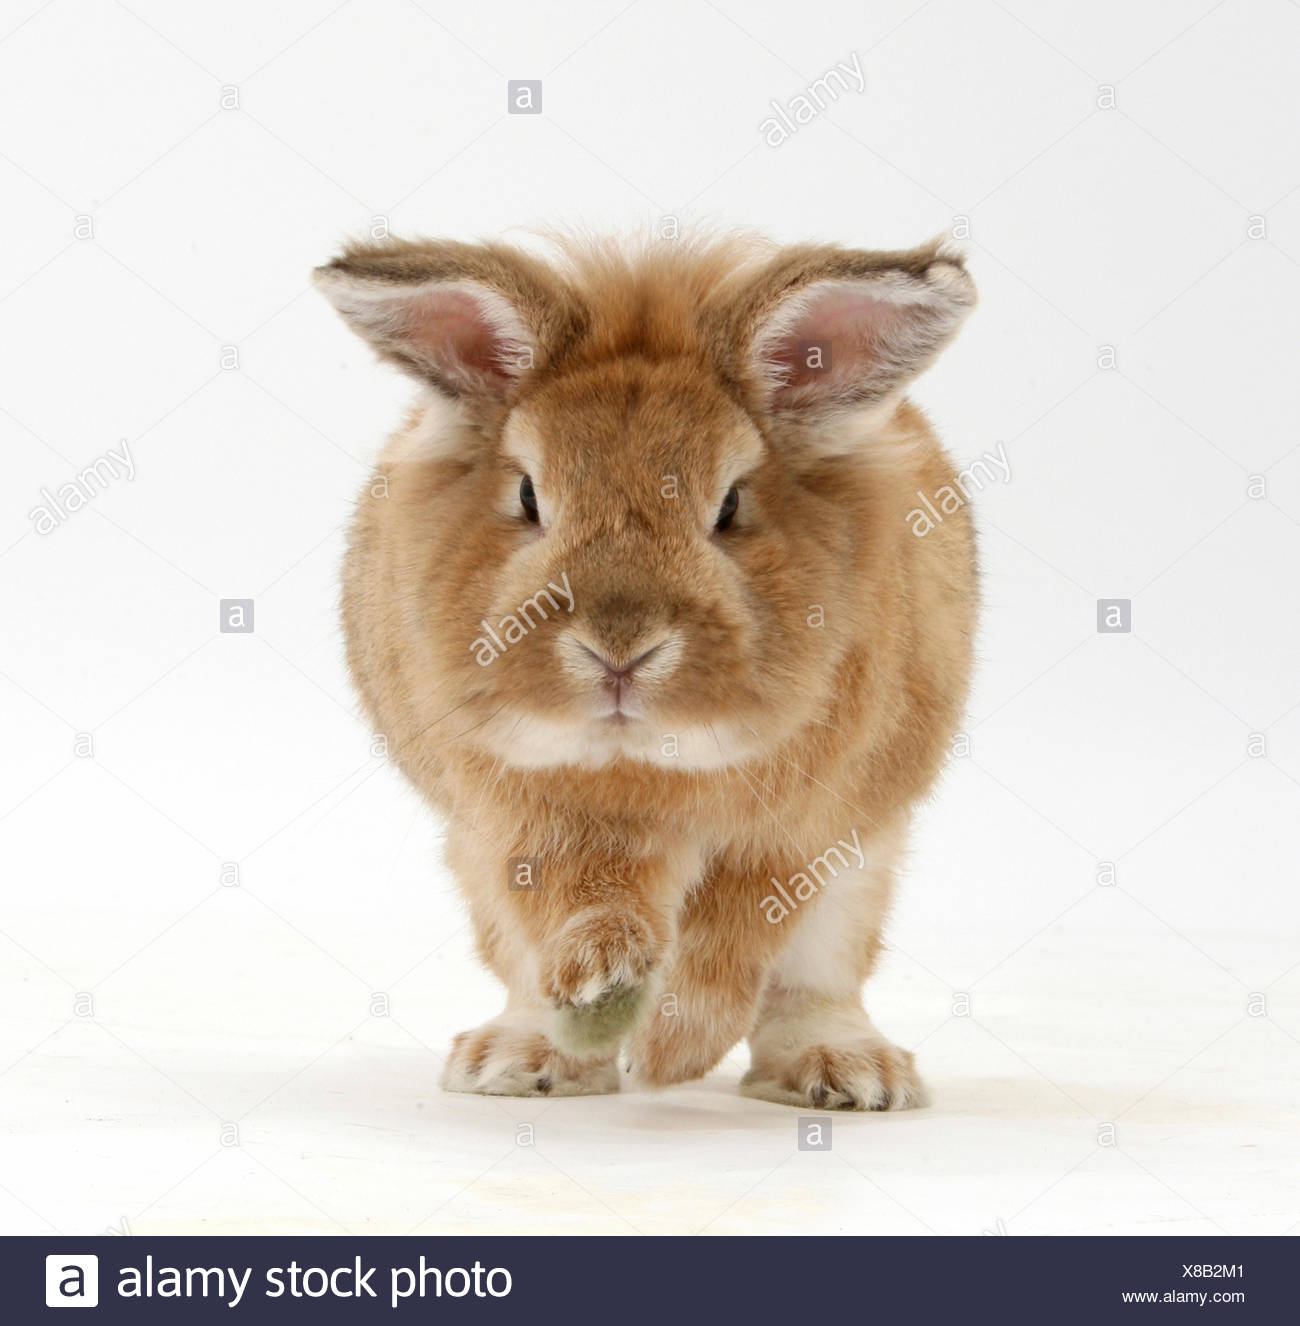 Lionhead x Lop rabbit, Tedson, running, against white background - Stock Image